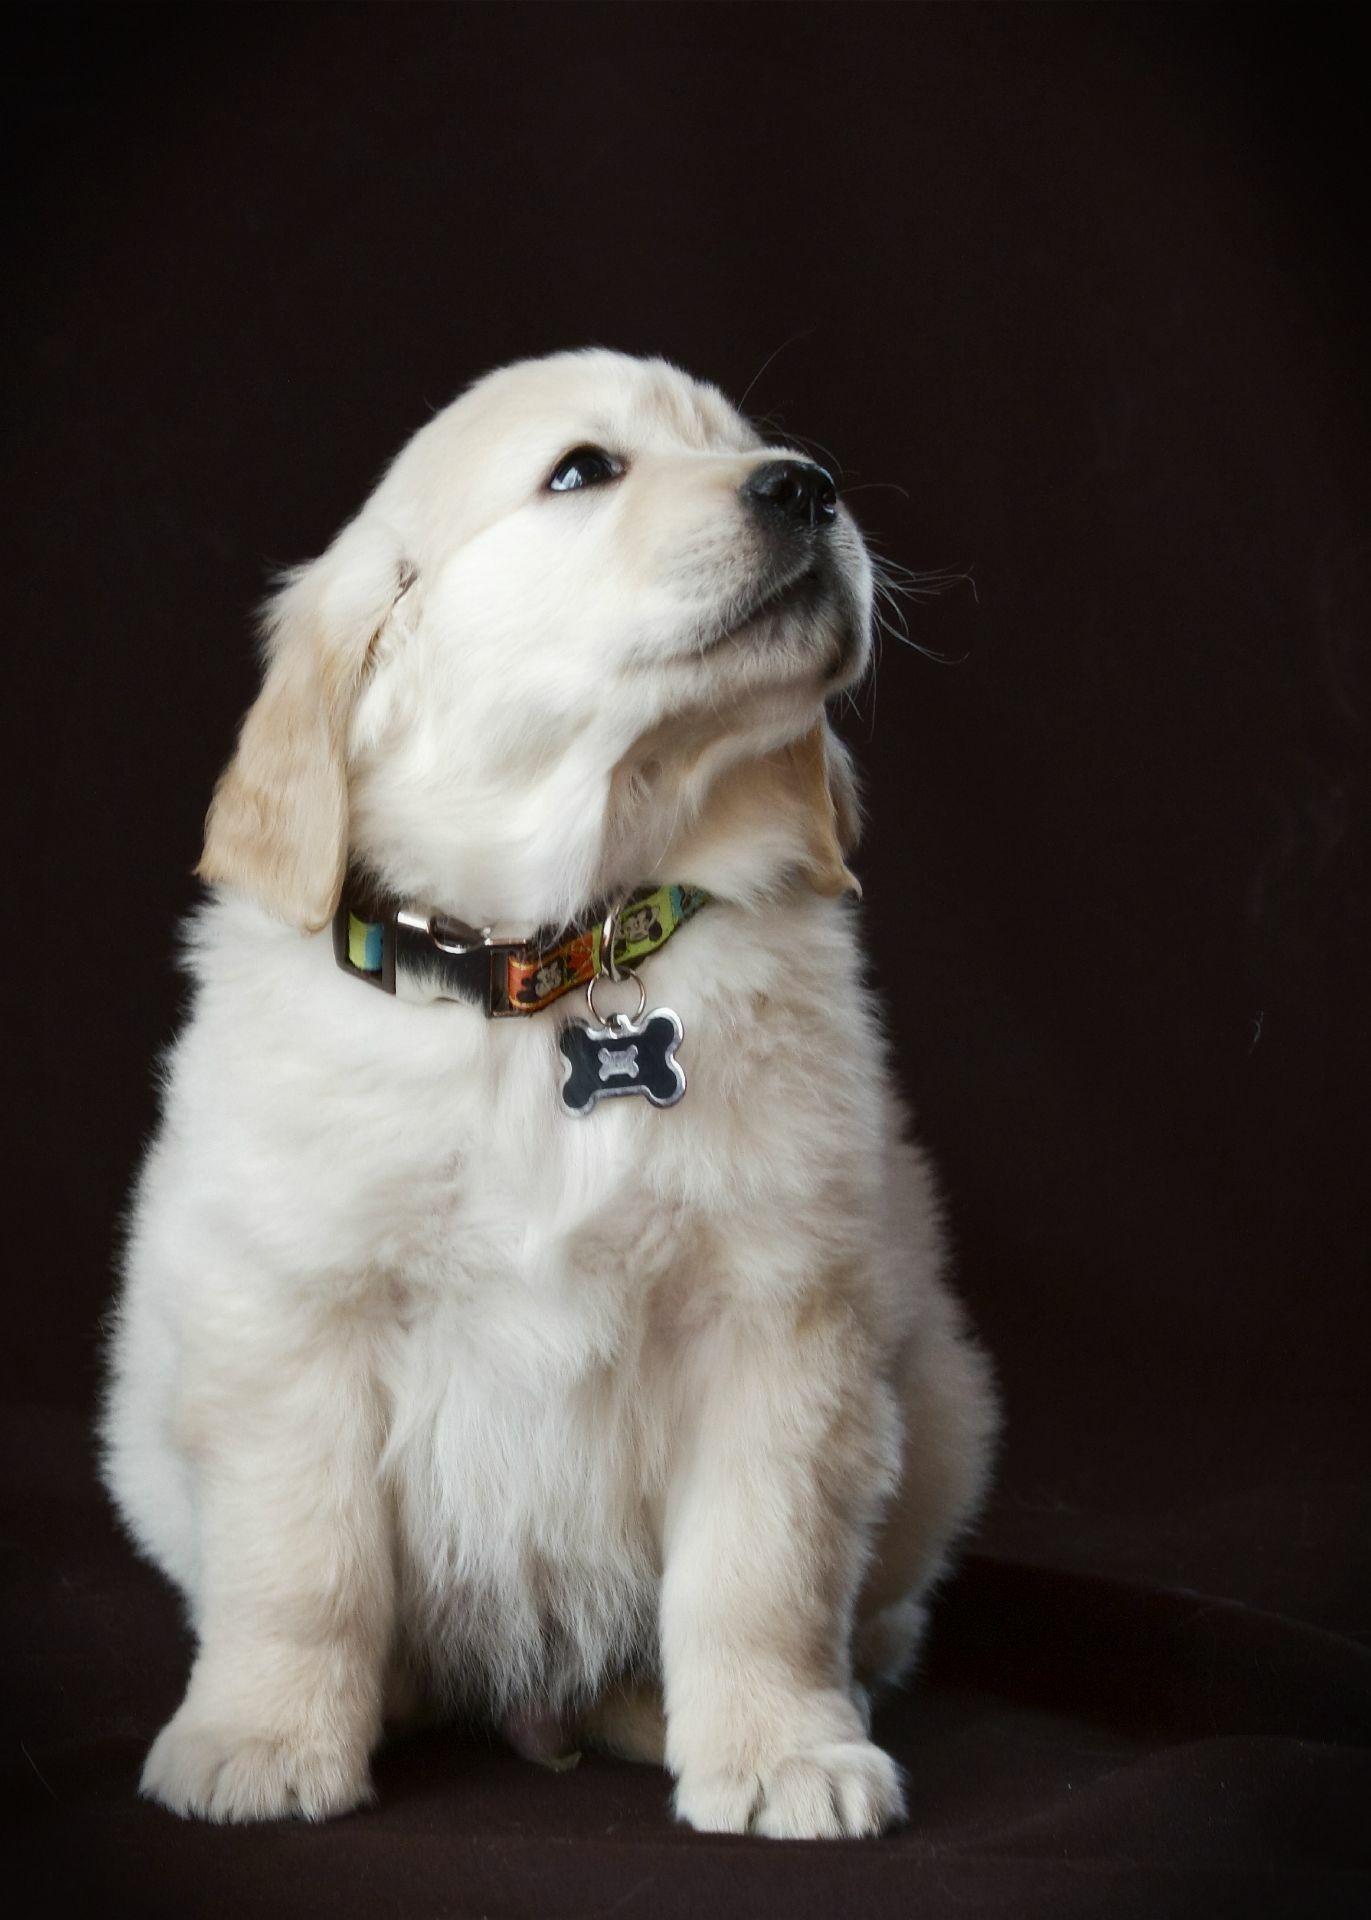 8 Week Old Puppy At Suncrest Golden Retrievers Fezziwig Golden